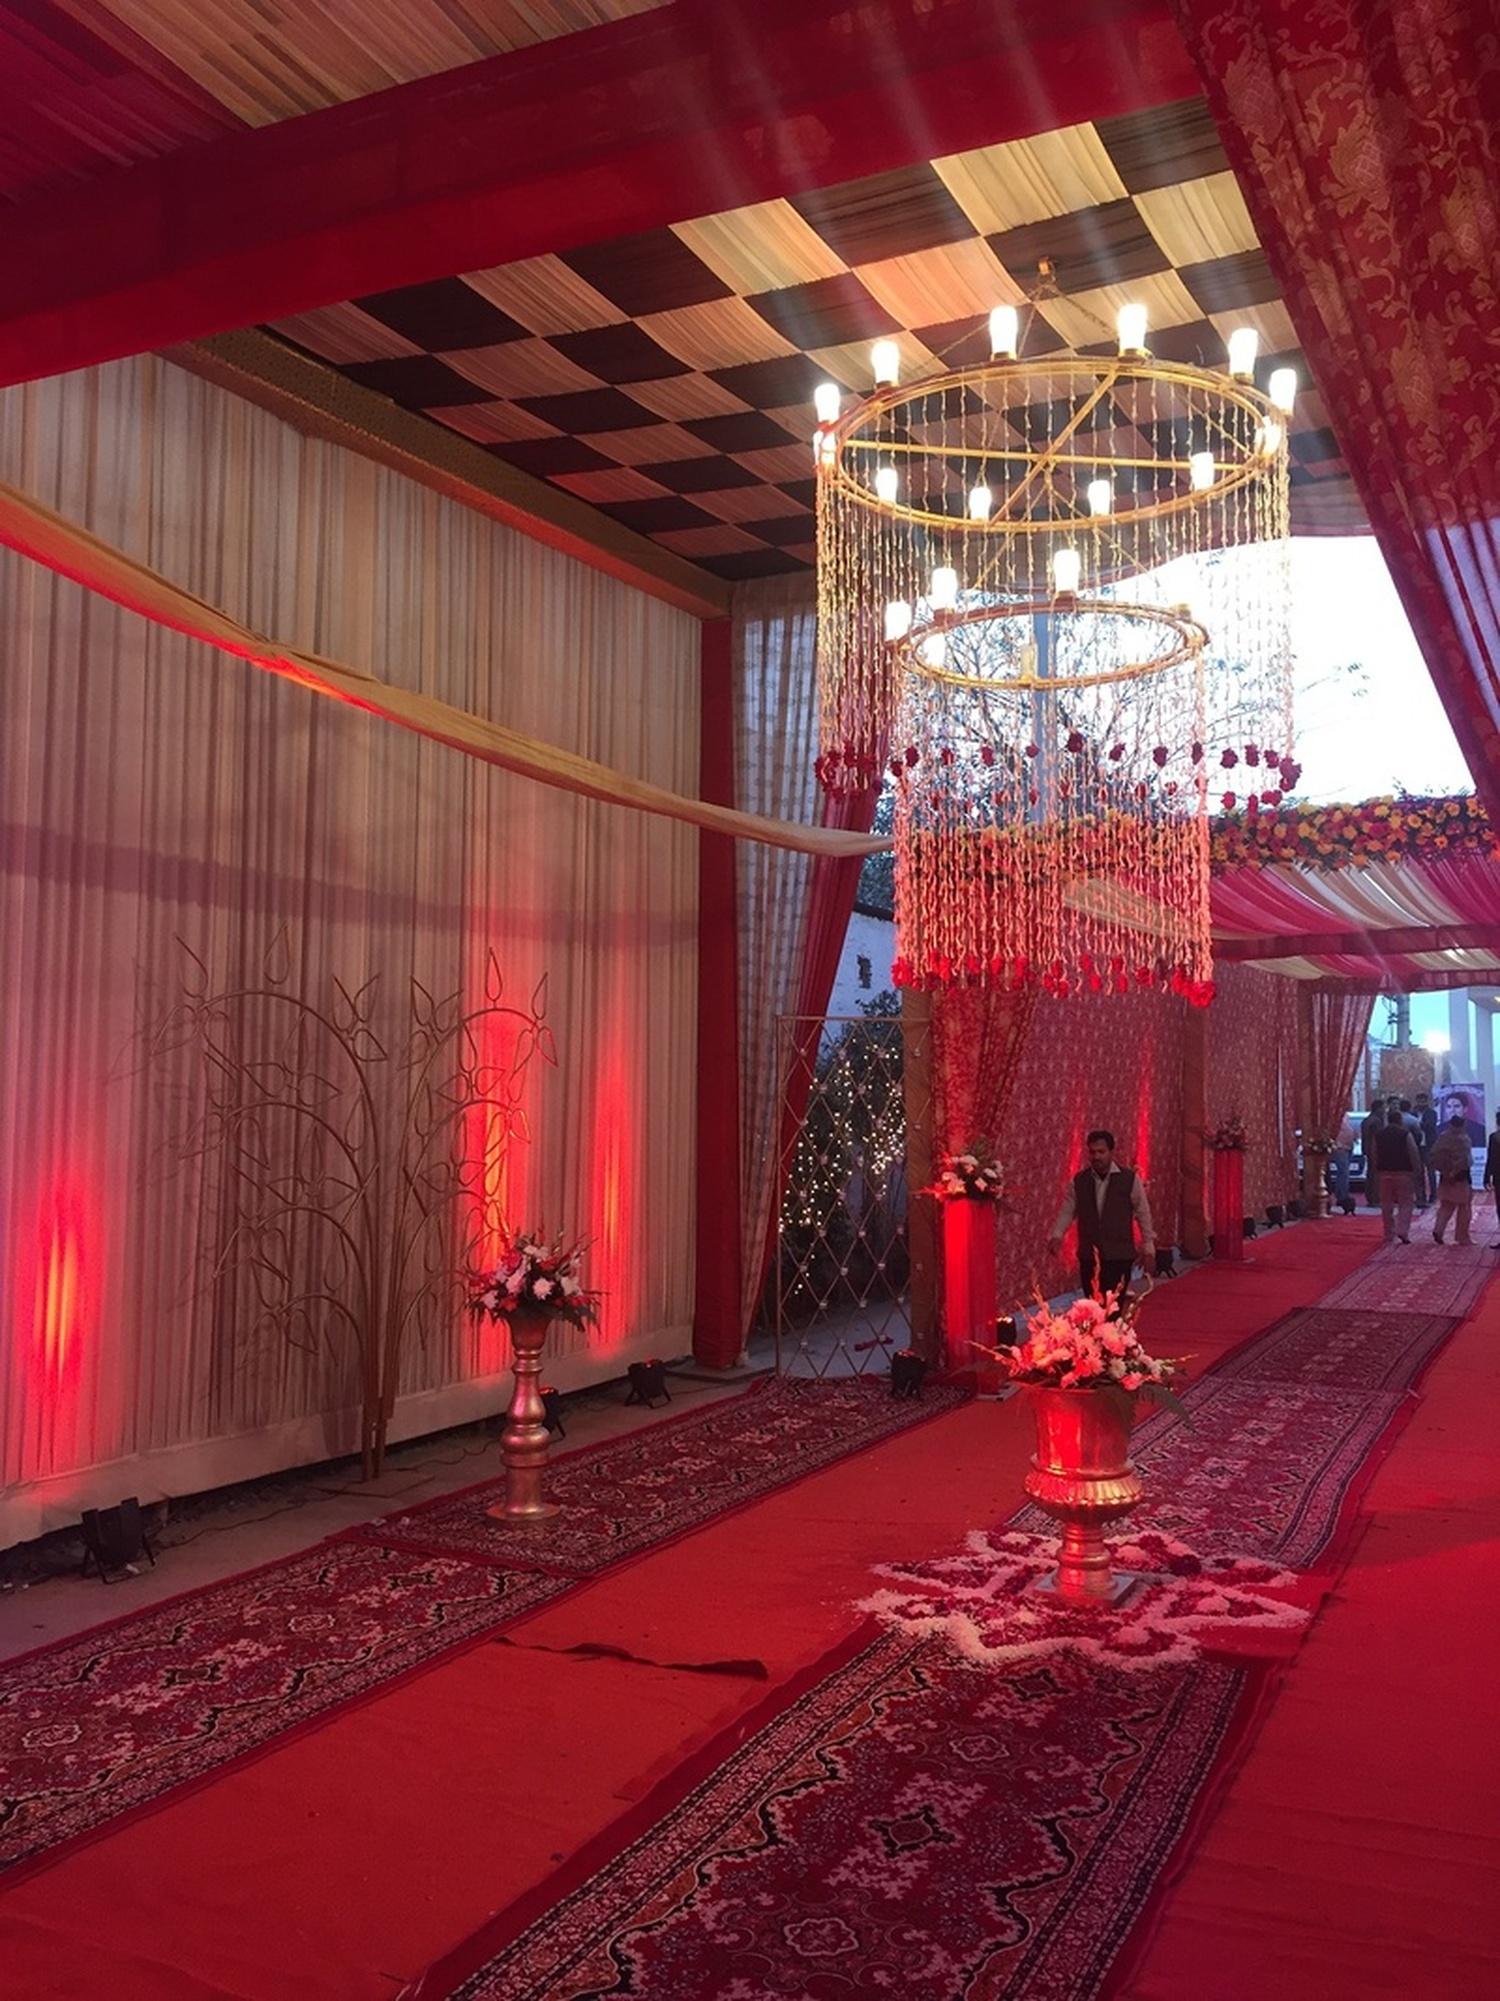 Le Foyer Art Dramatique : Le foyer banquets gurgaon delhi banquet hall wedding